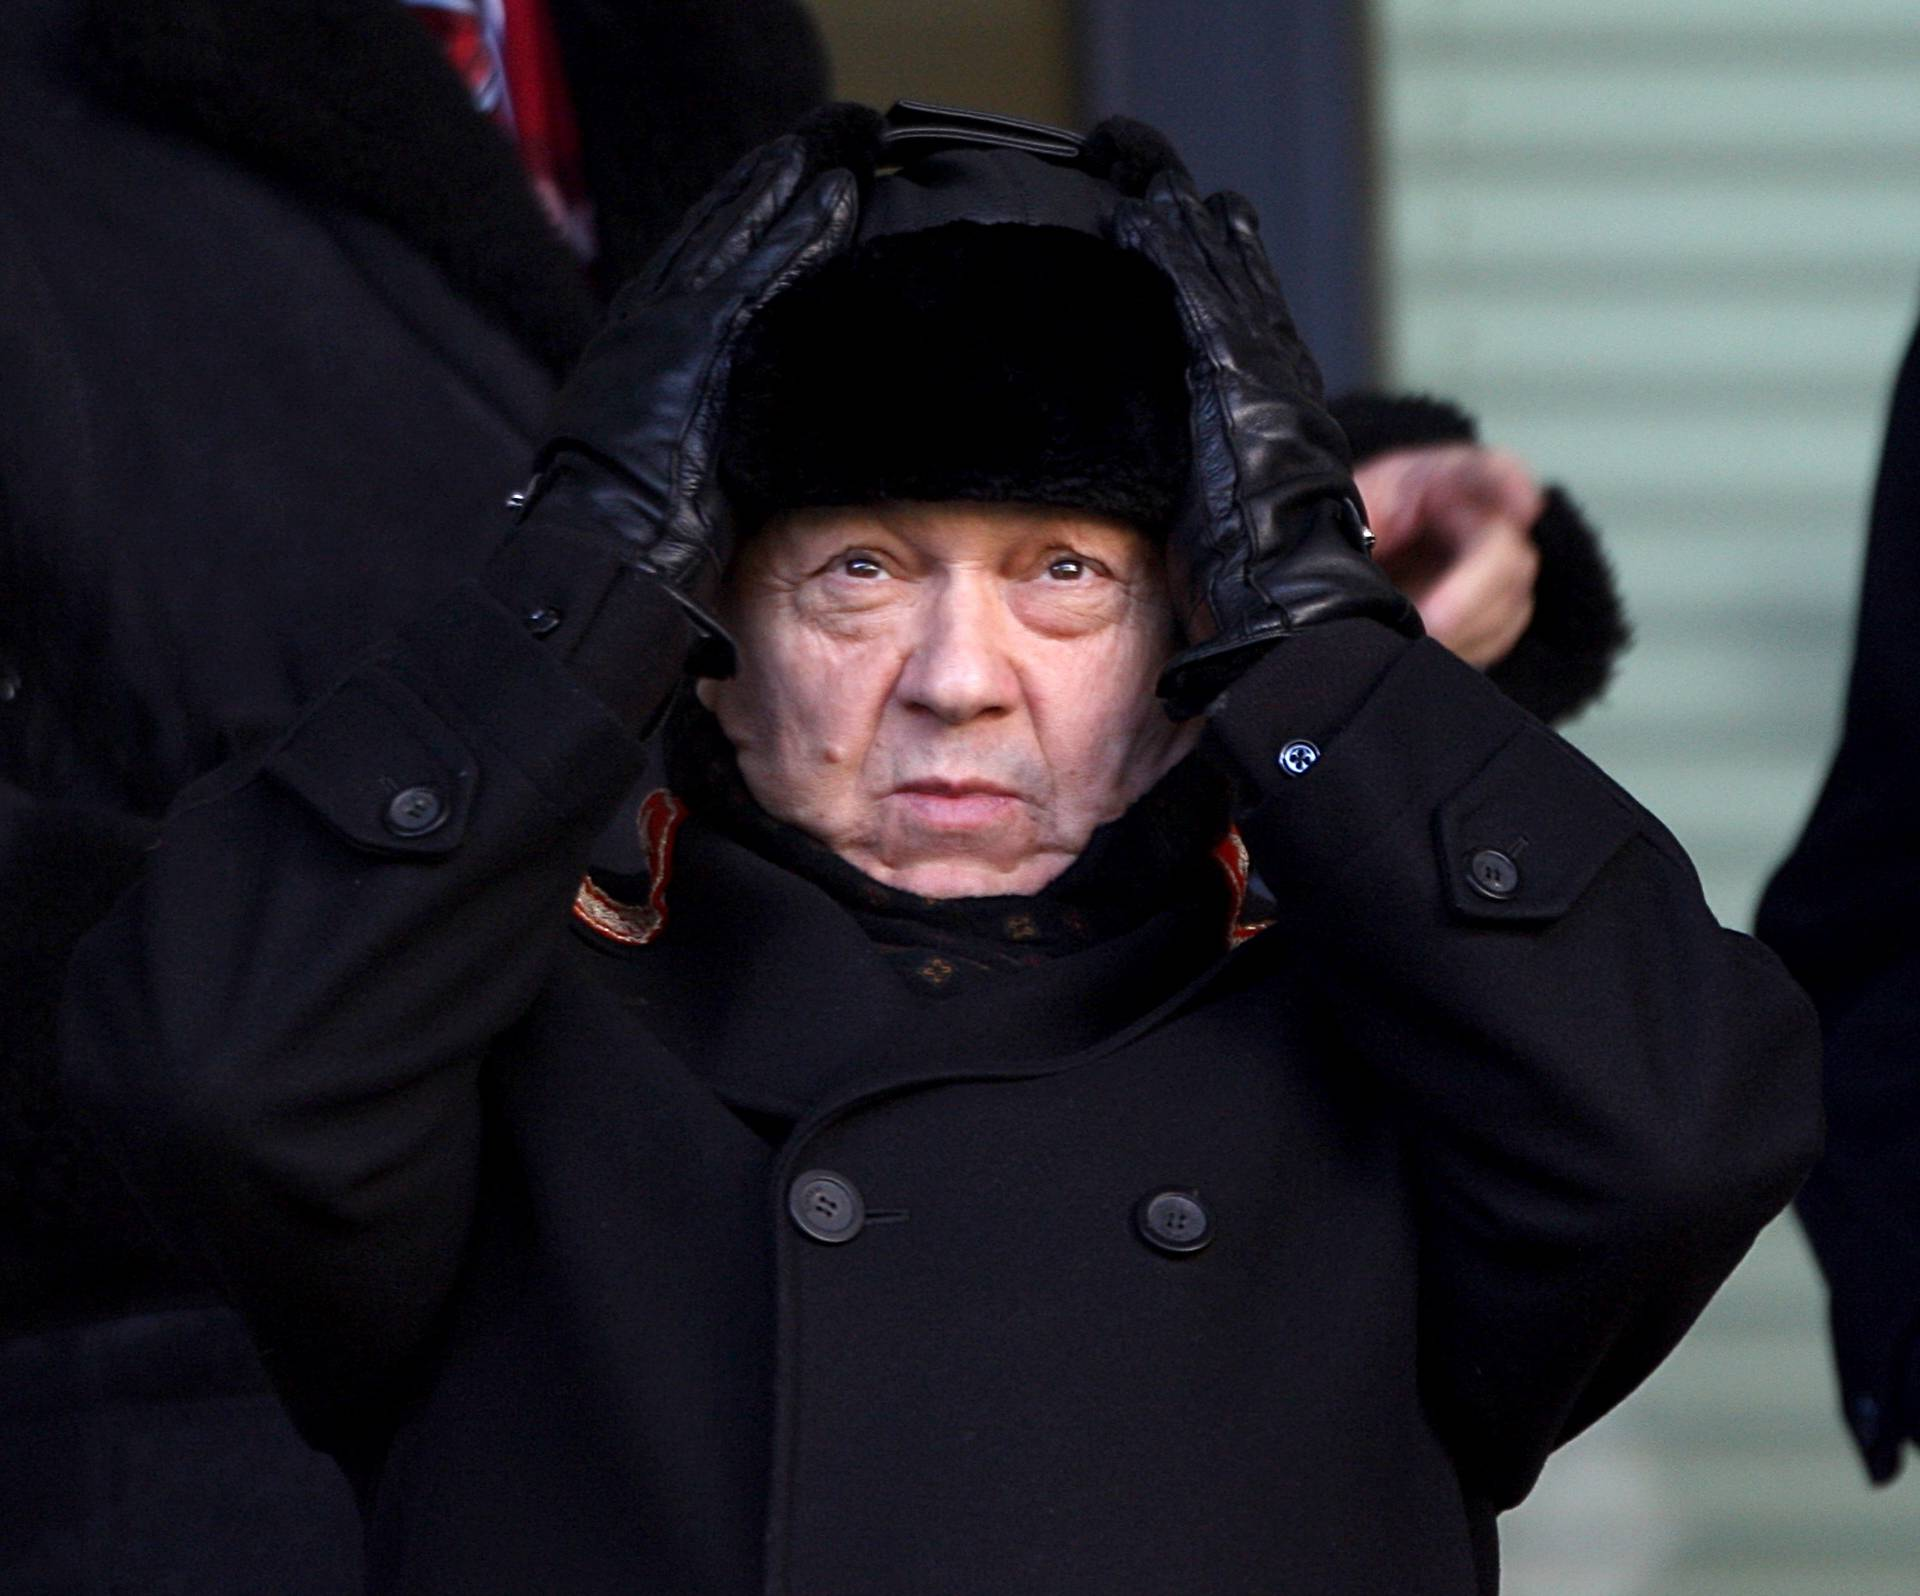 Soccer - Barclays Premier League - West Bromwich Albion v West Ham United - The Hawthorns